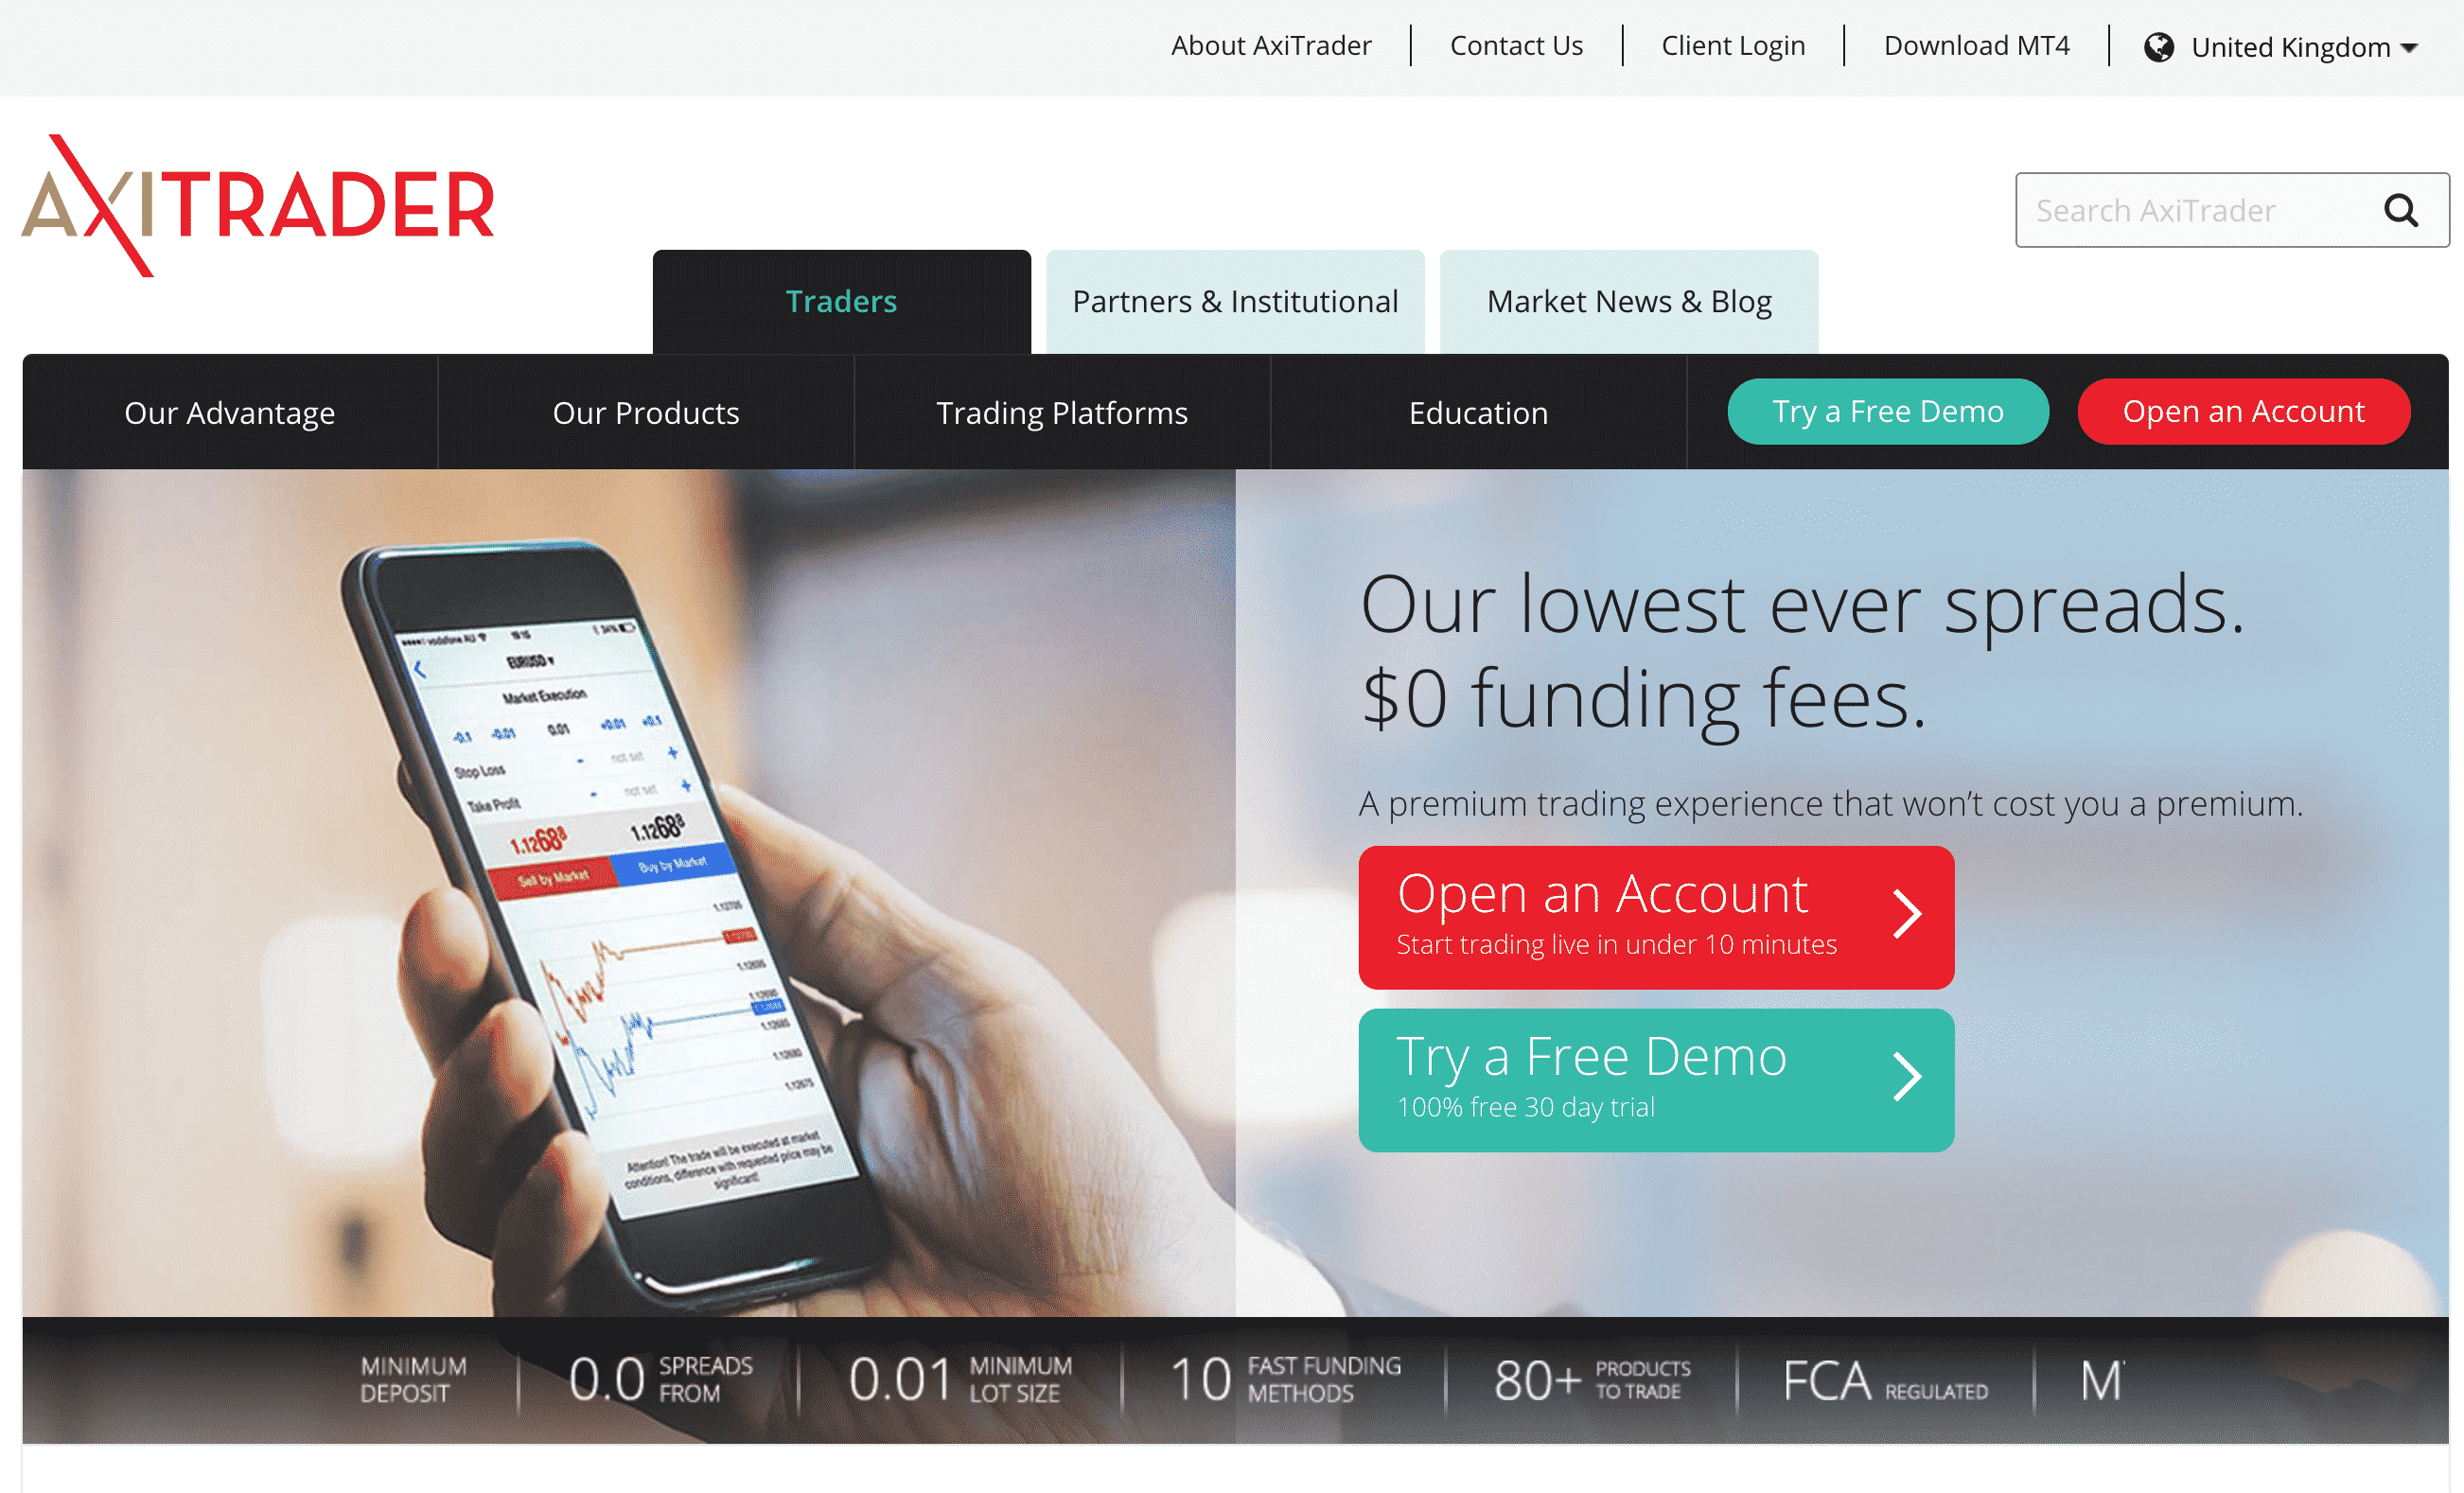 AxiTrader Website Screenshot